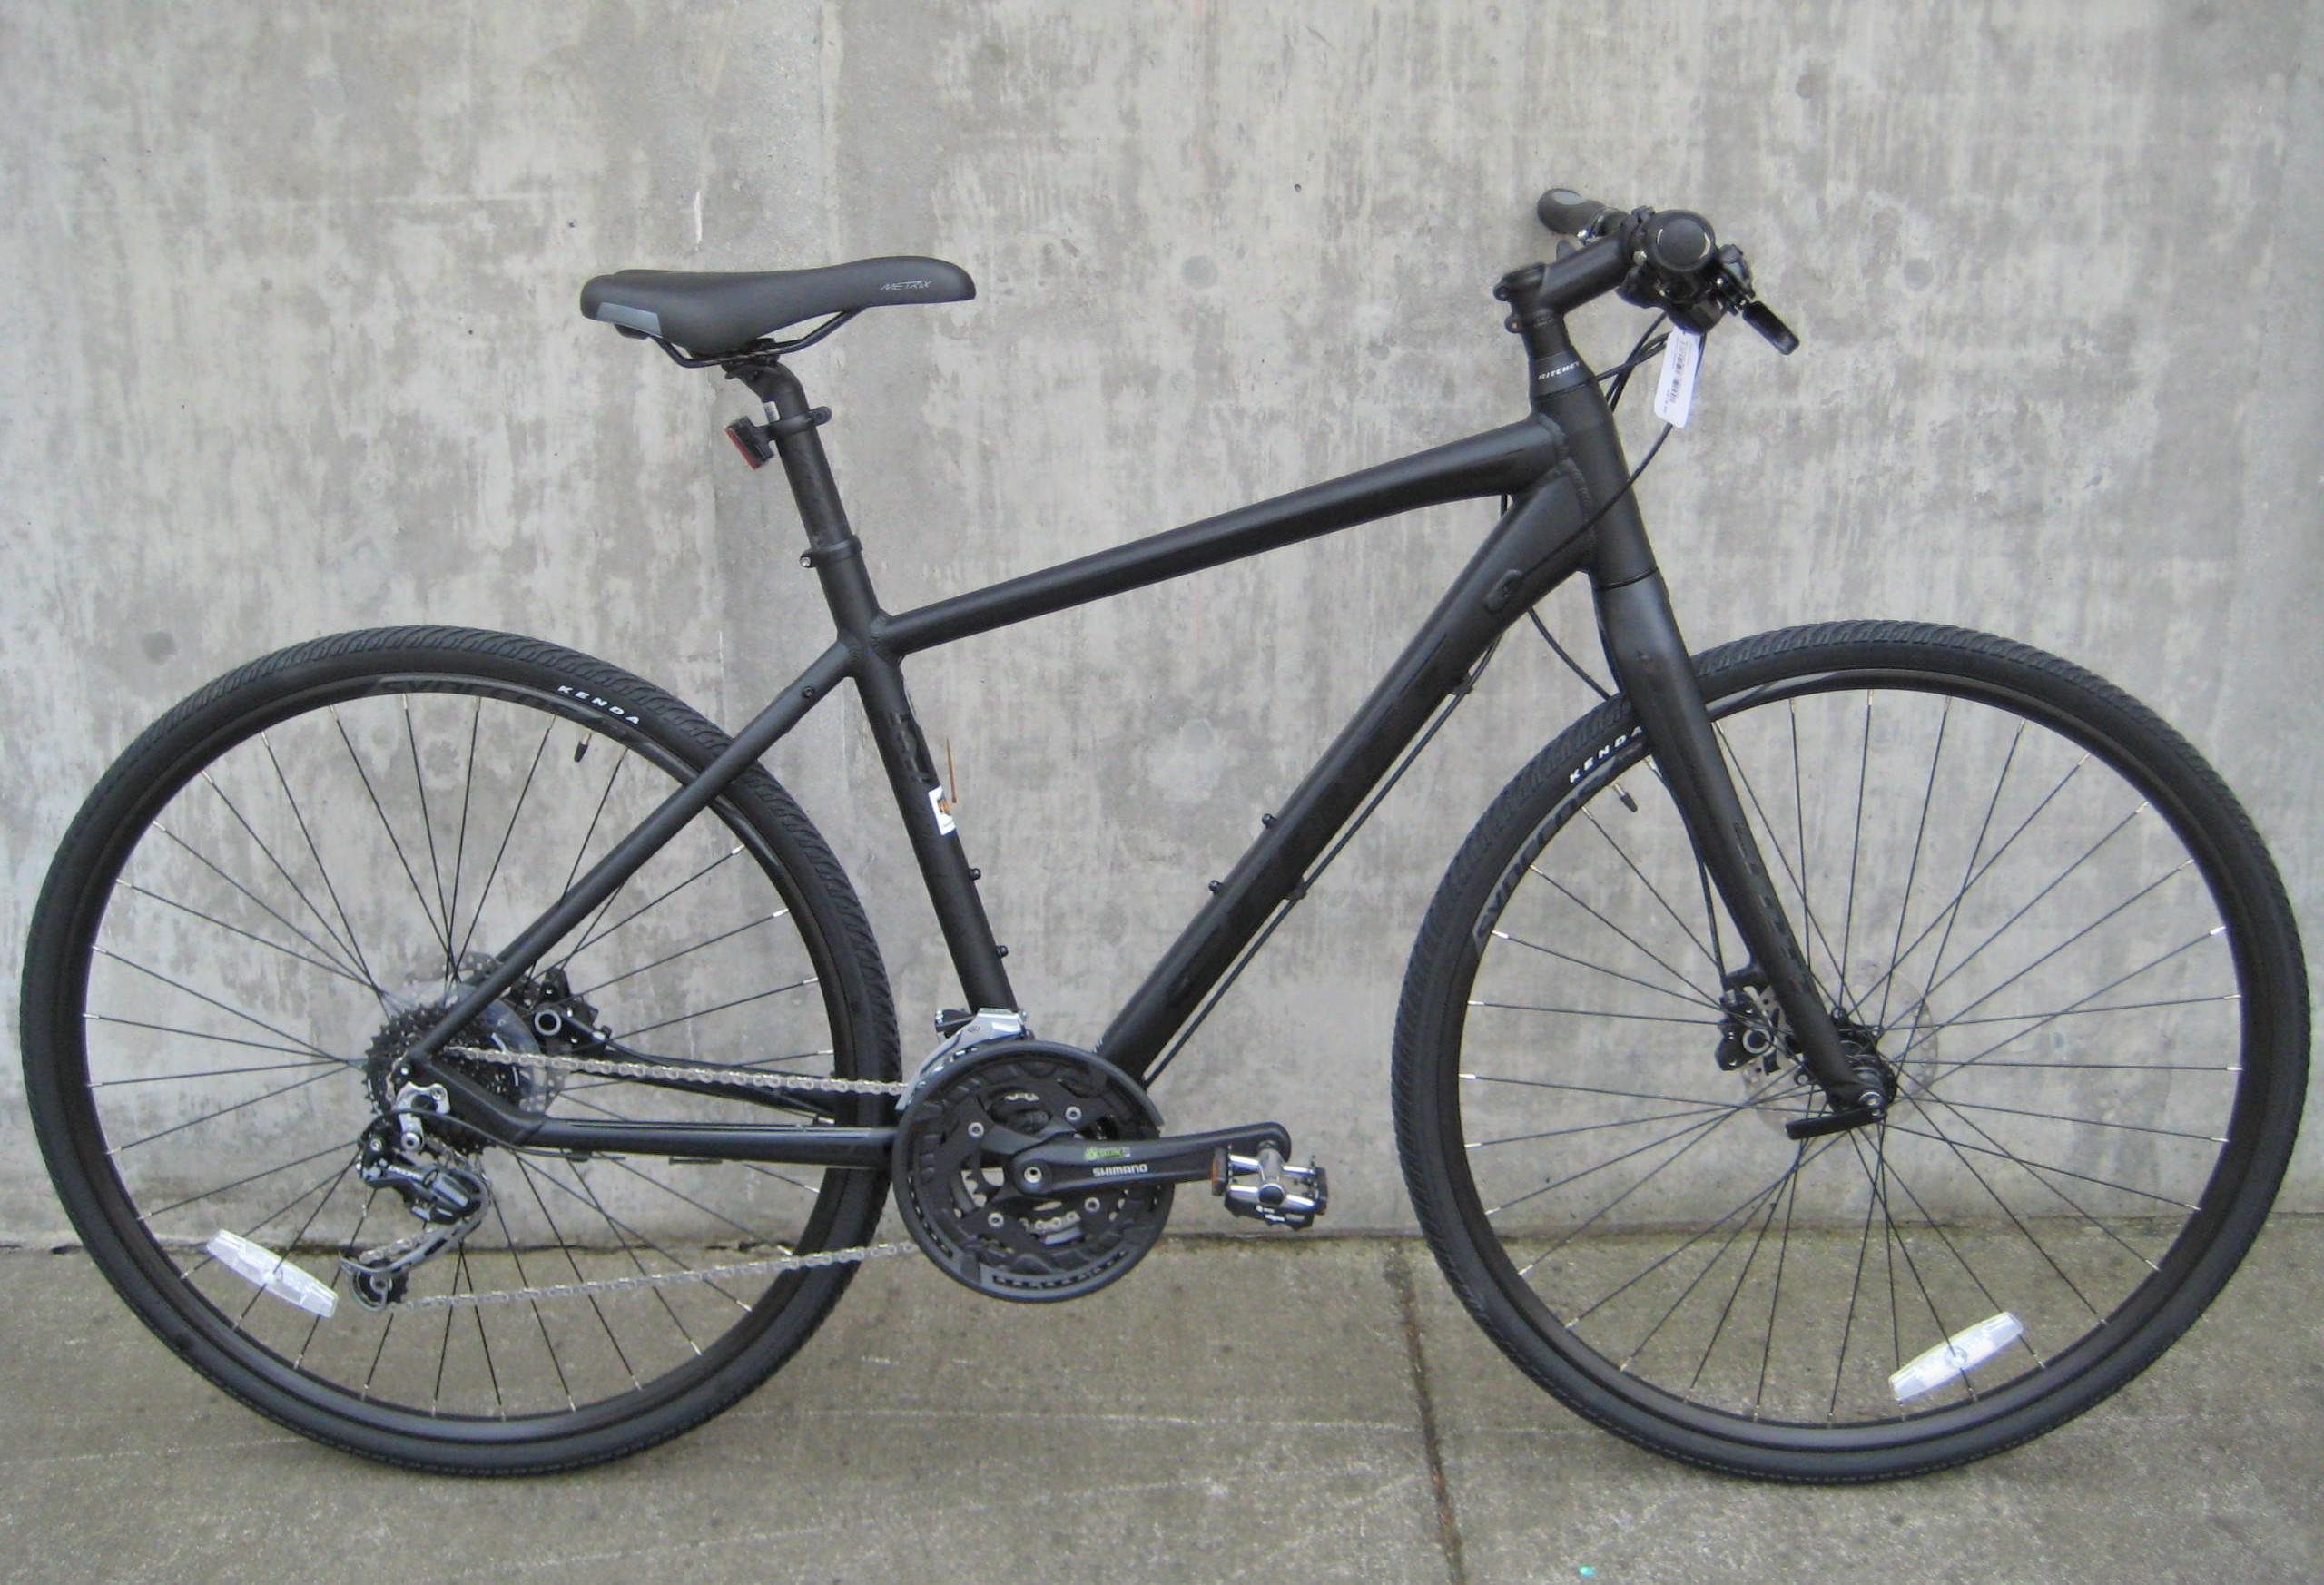 8c01cf11436 Hybrid | Classic Cycle Bainbridge Island Kitsap County